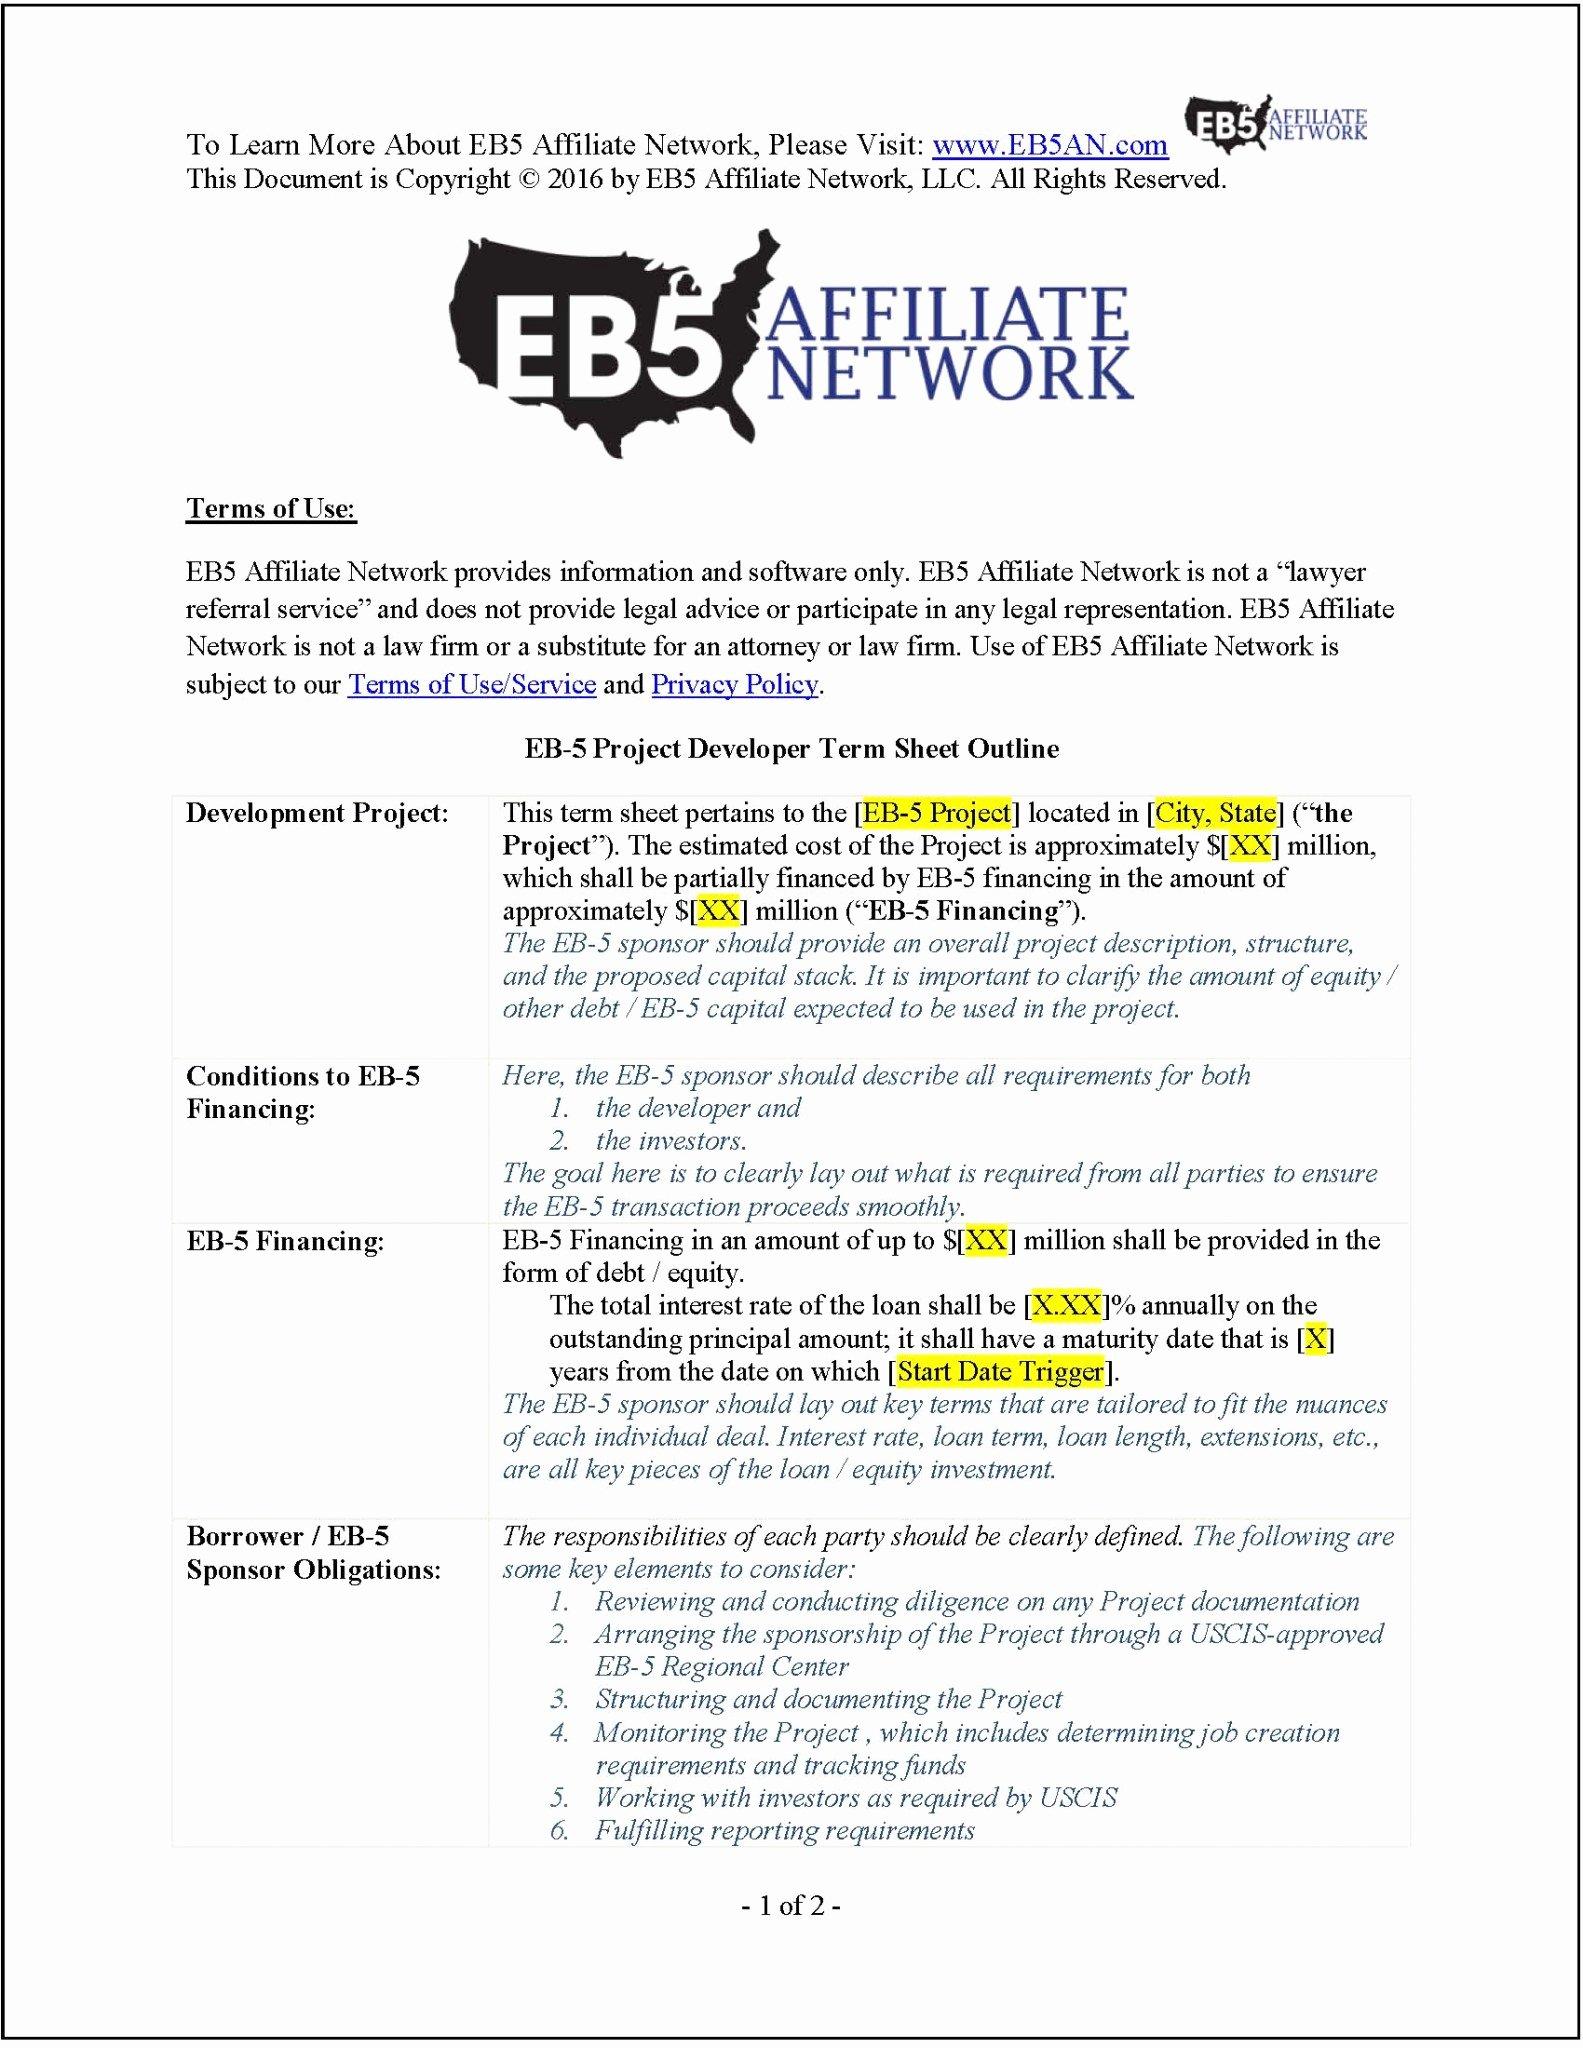 Real Estate Term Sheet Inspirational Sample Eb 5 Project Developer Term Sheet